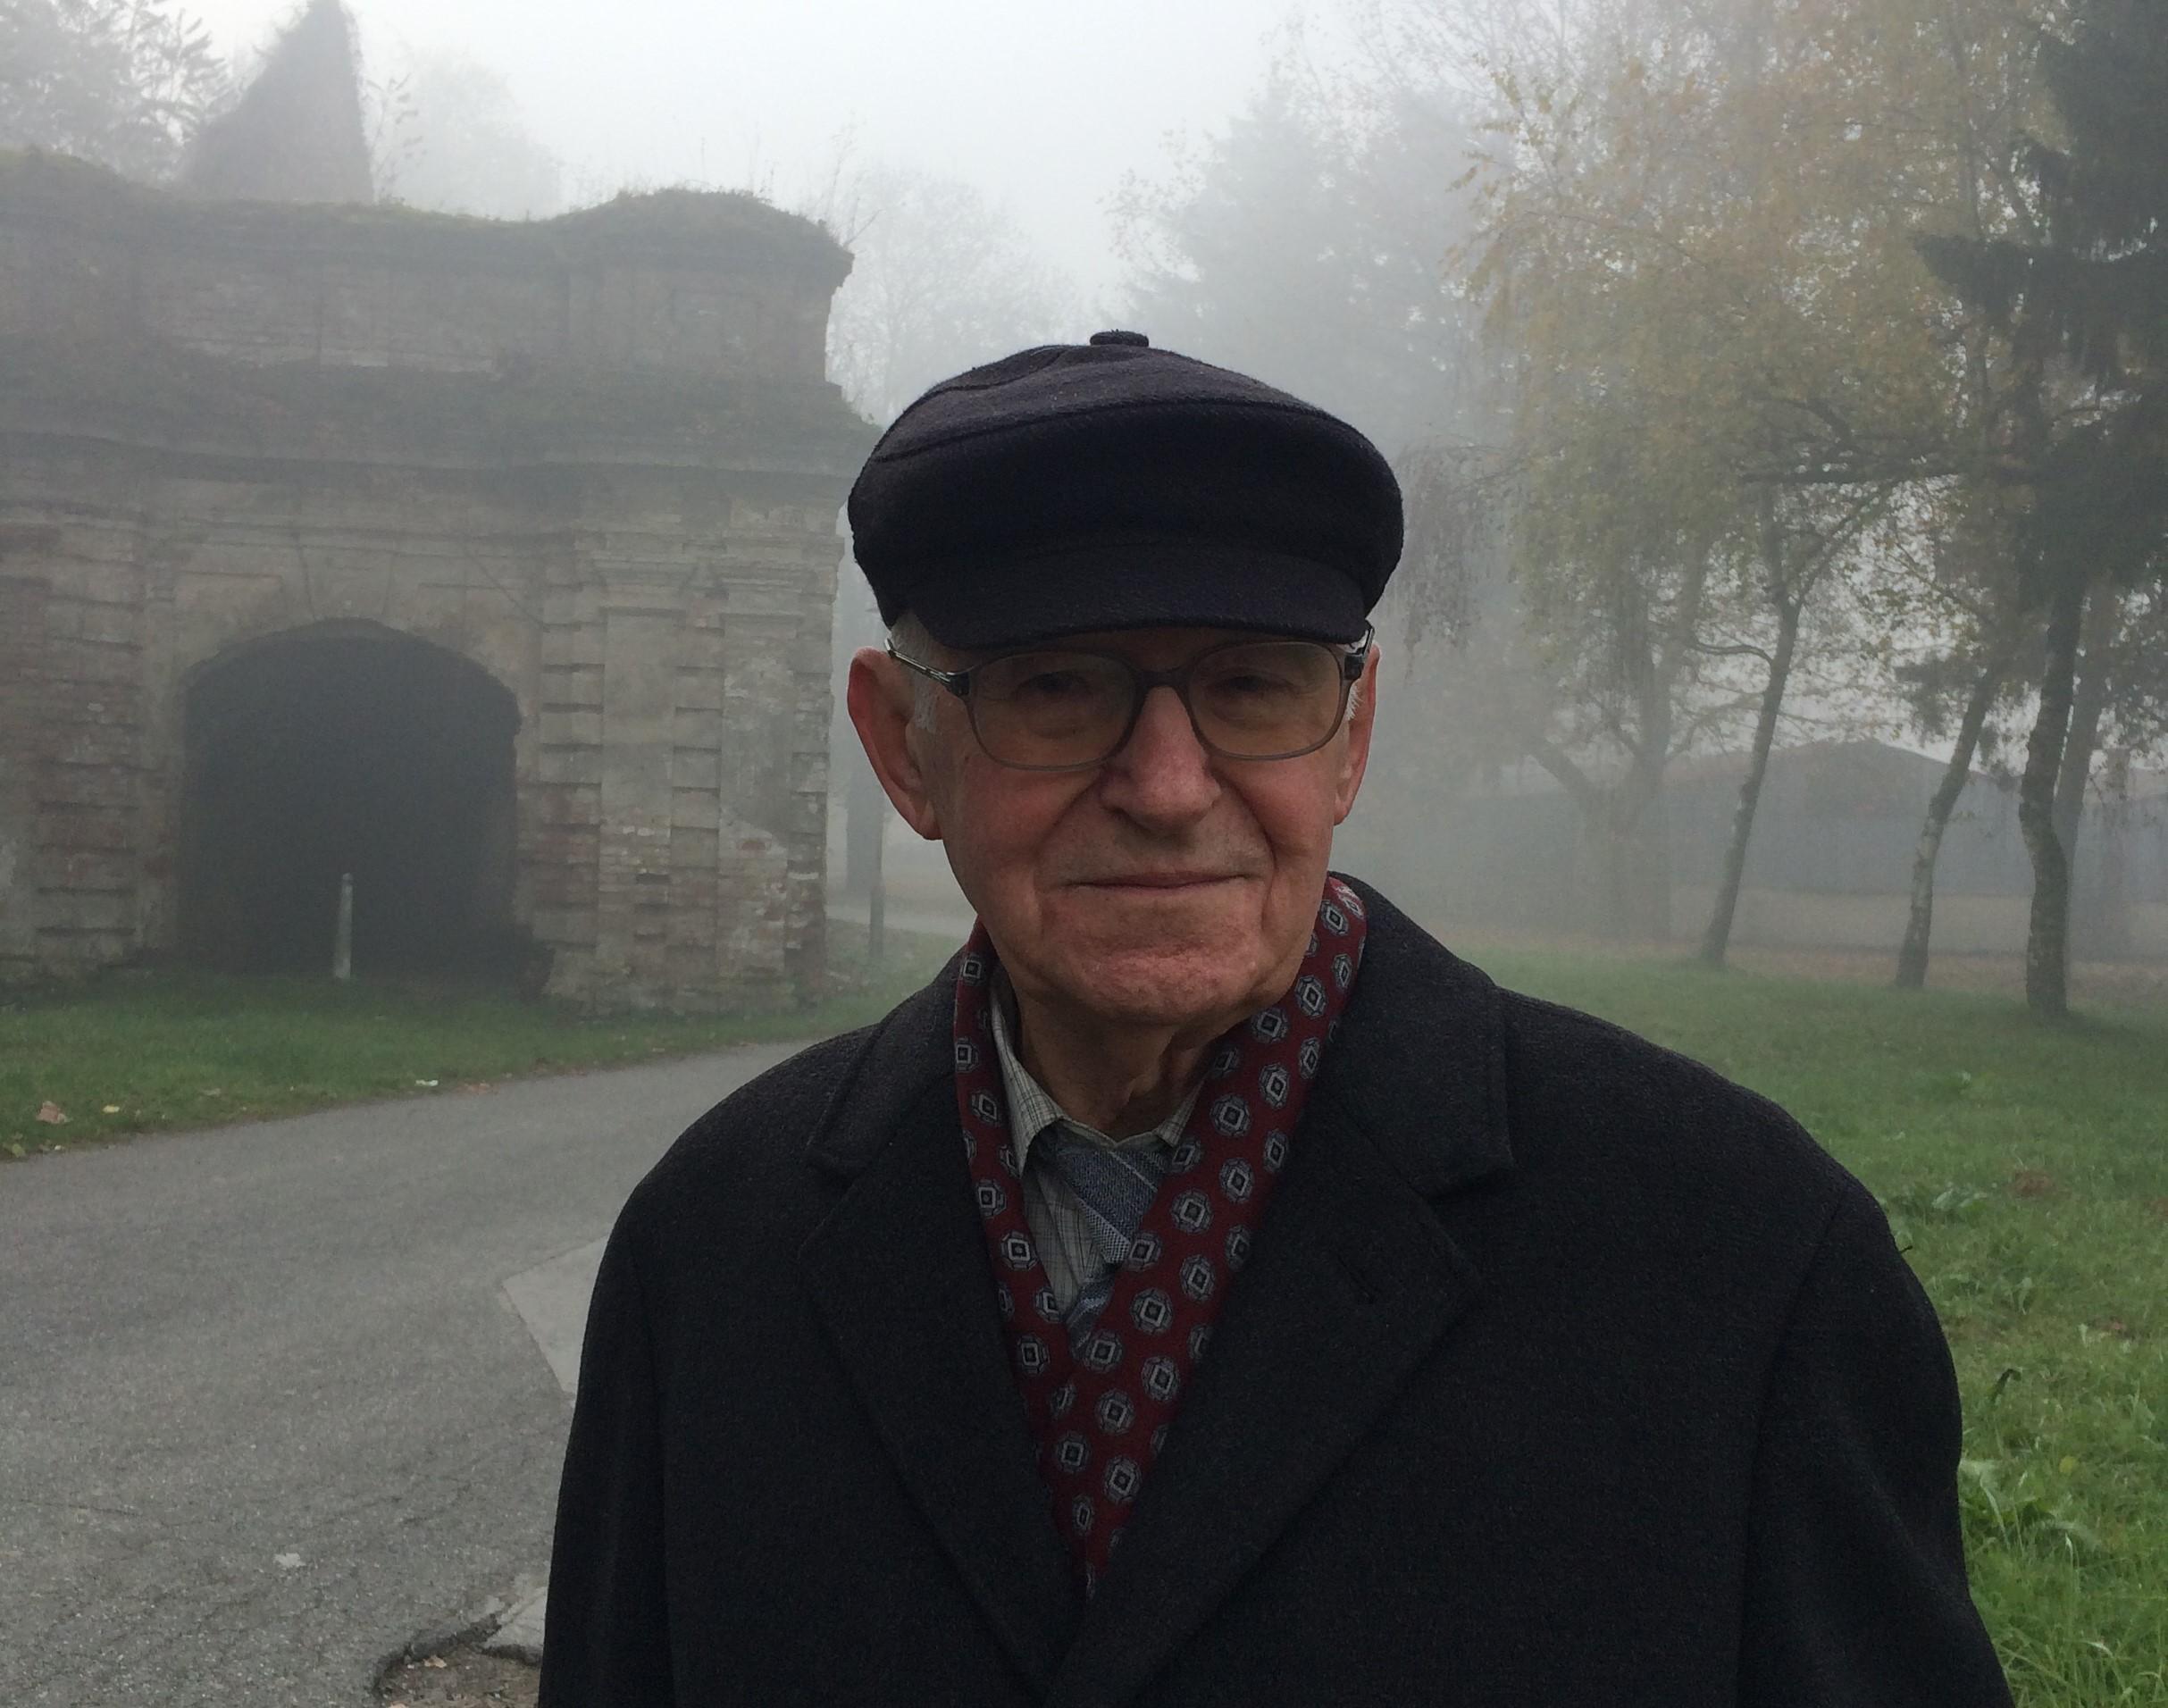 Milorad Jandrić na snimanju 2015. u Staroj Gradiški